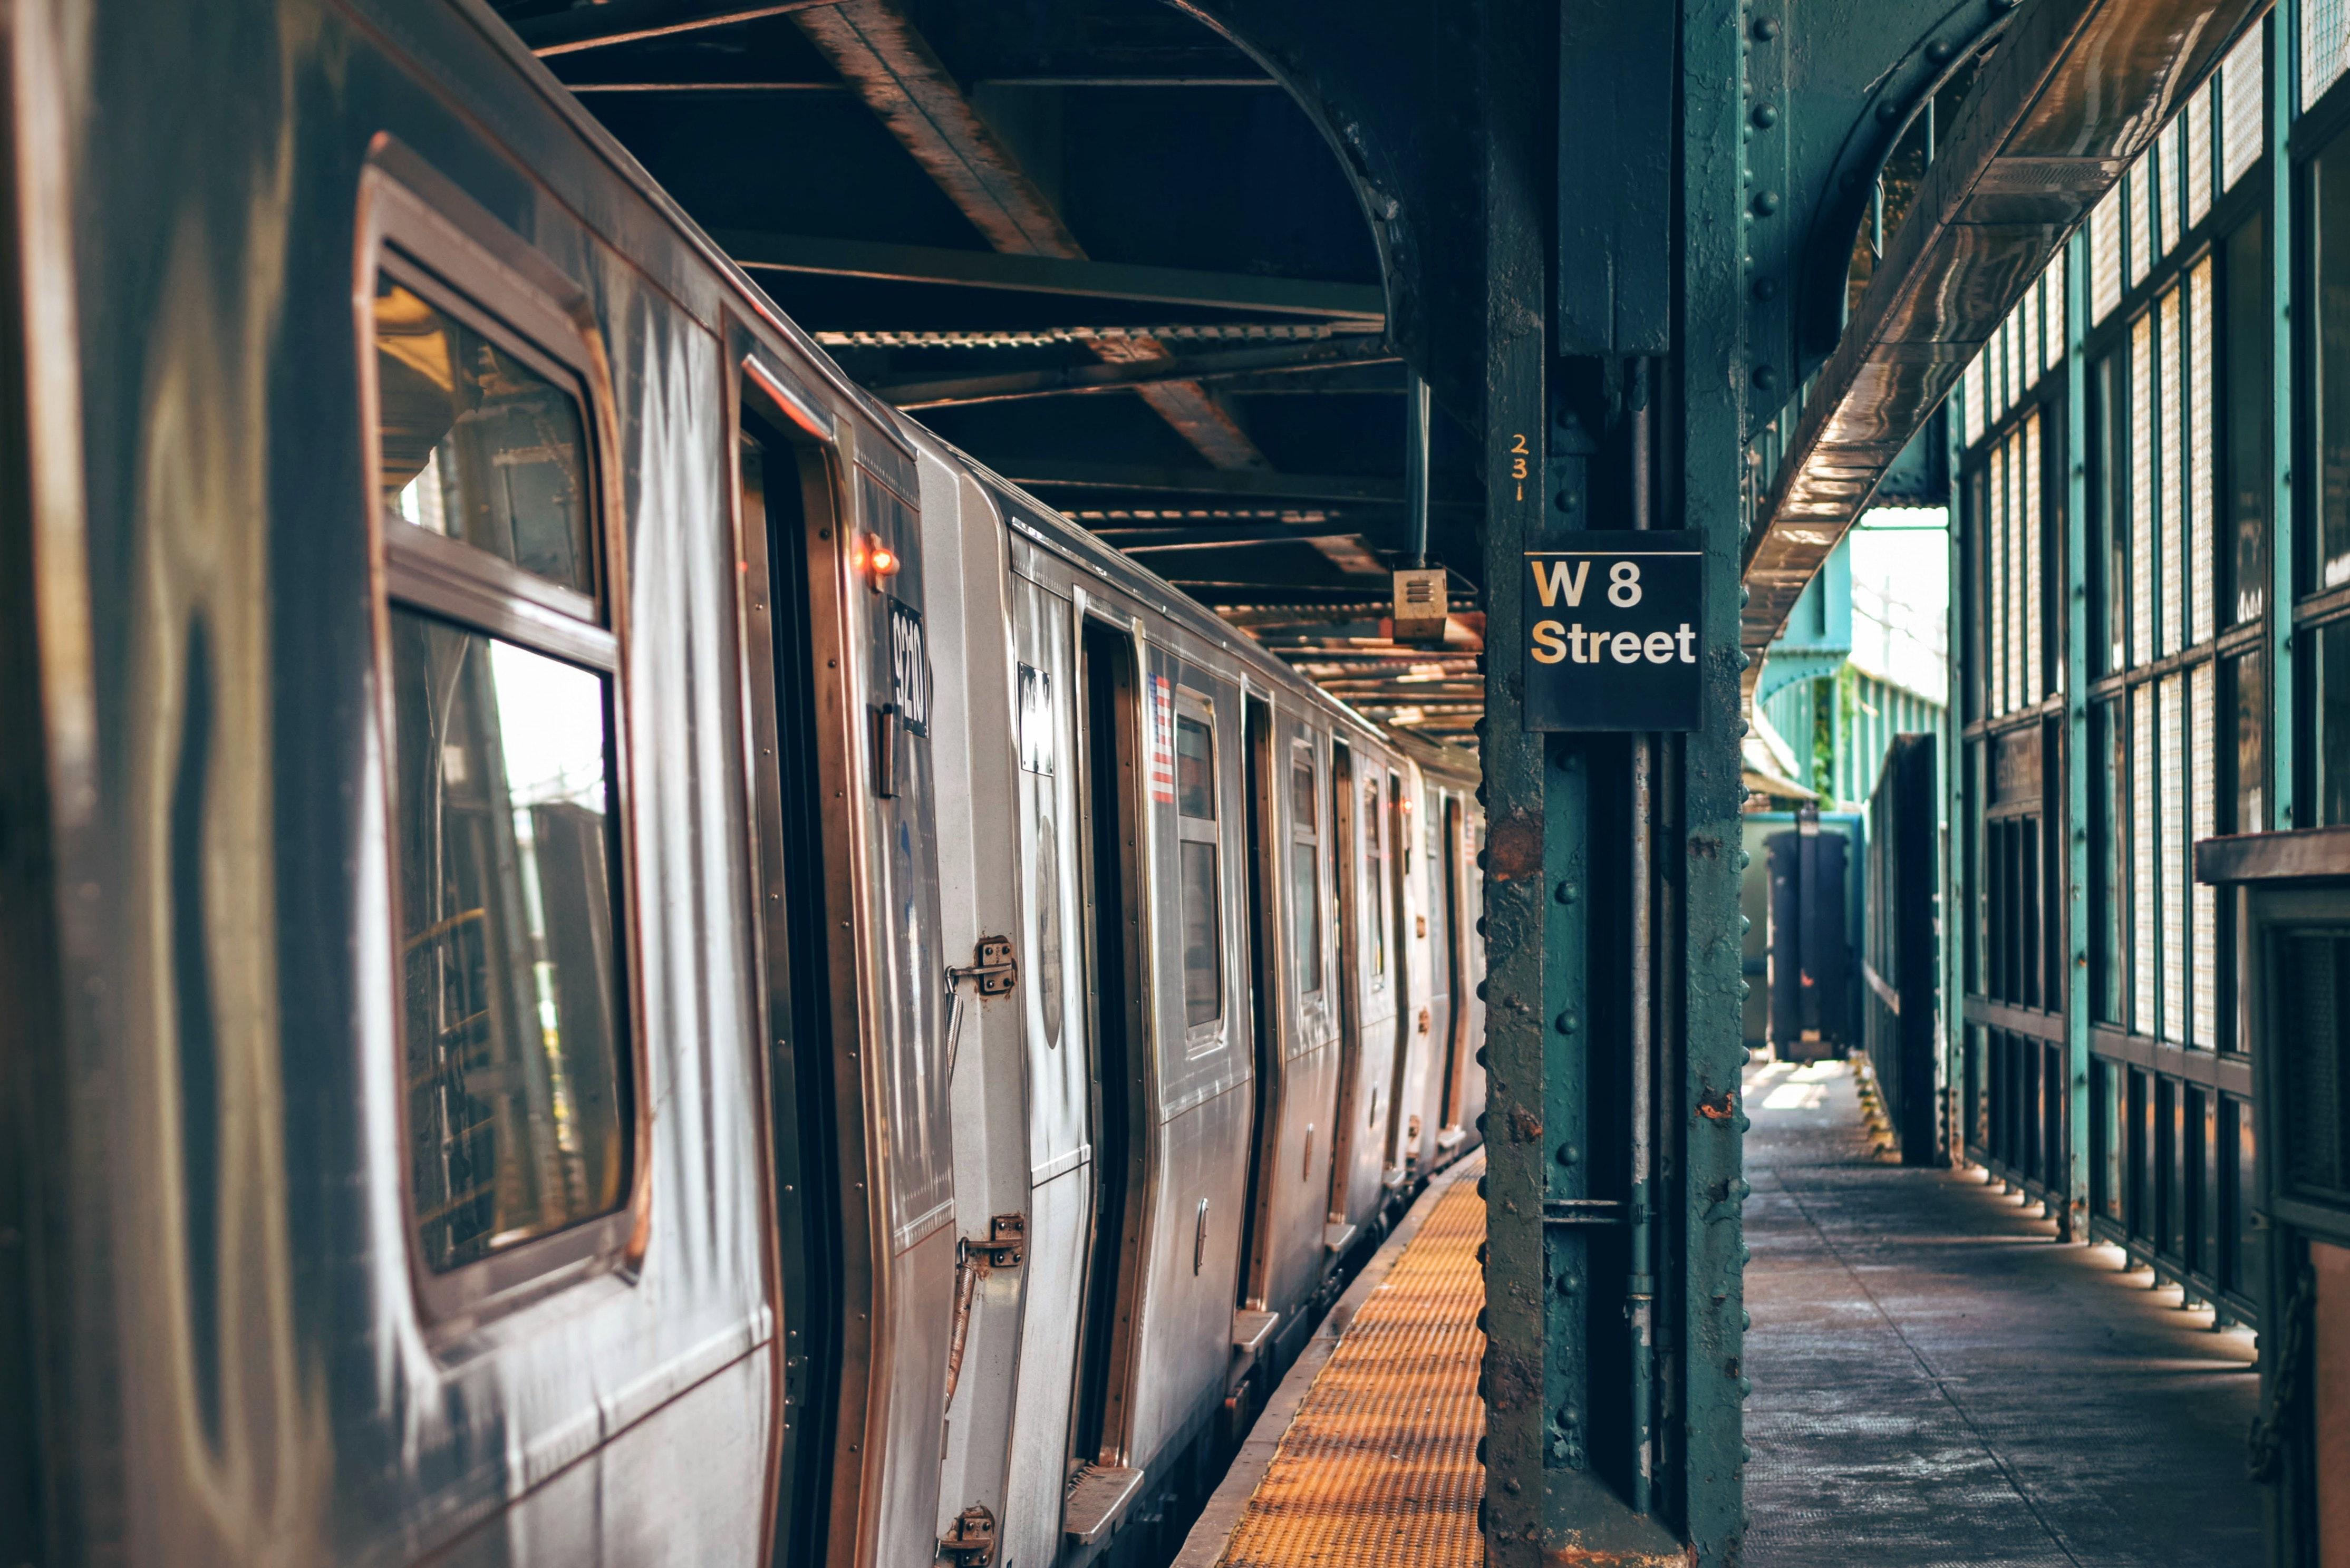 Silver Train on W8 Street Platform, Architecture, Railway, Urban, Trip, HQ Photo